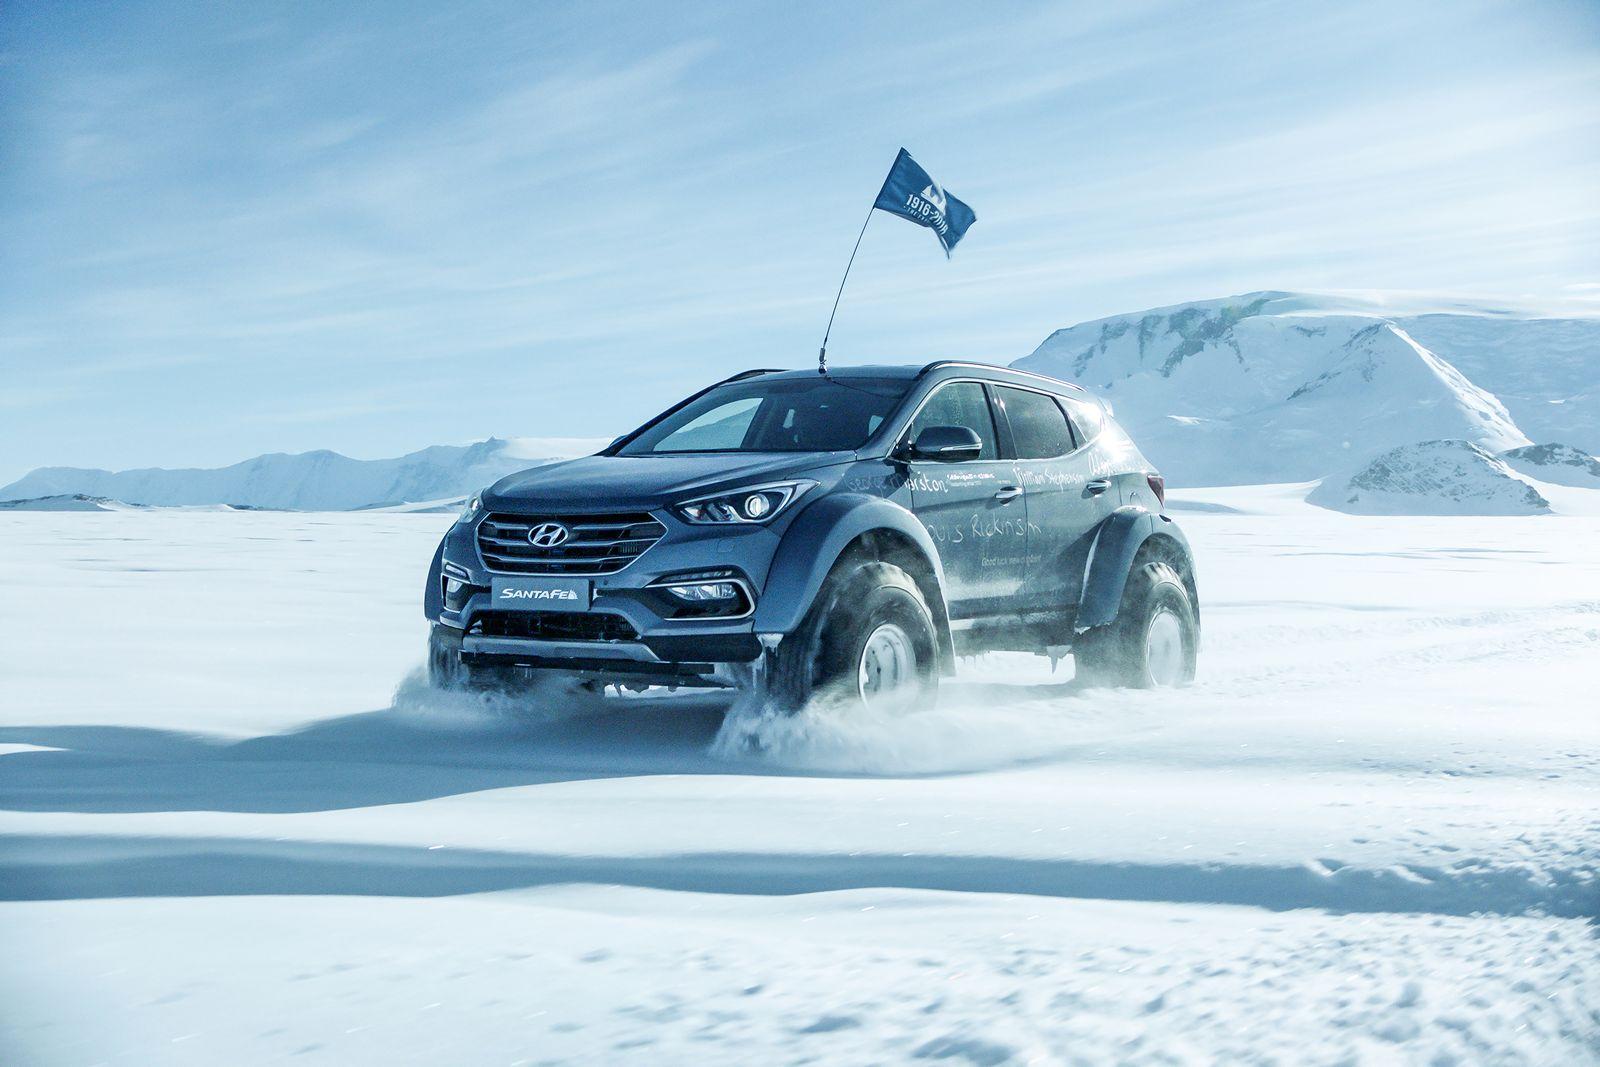 Hyundai Sante Fe Antarctic (3)